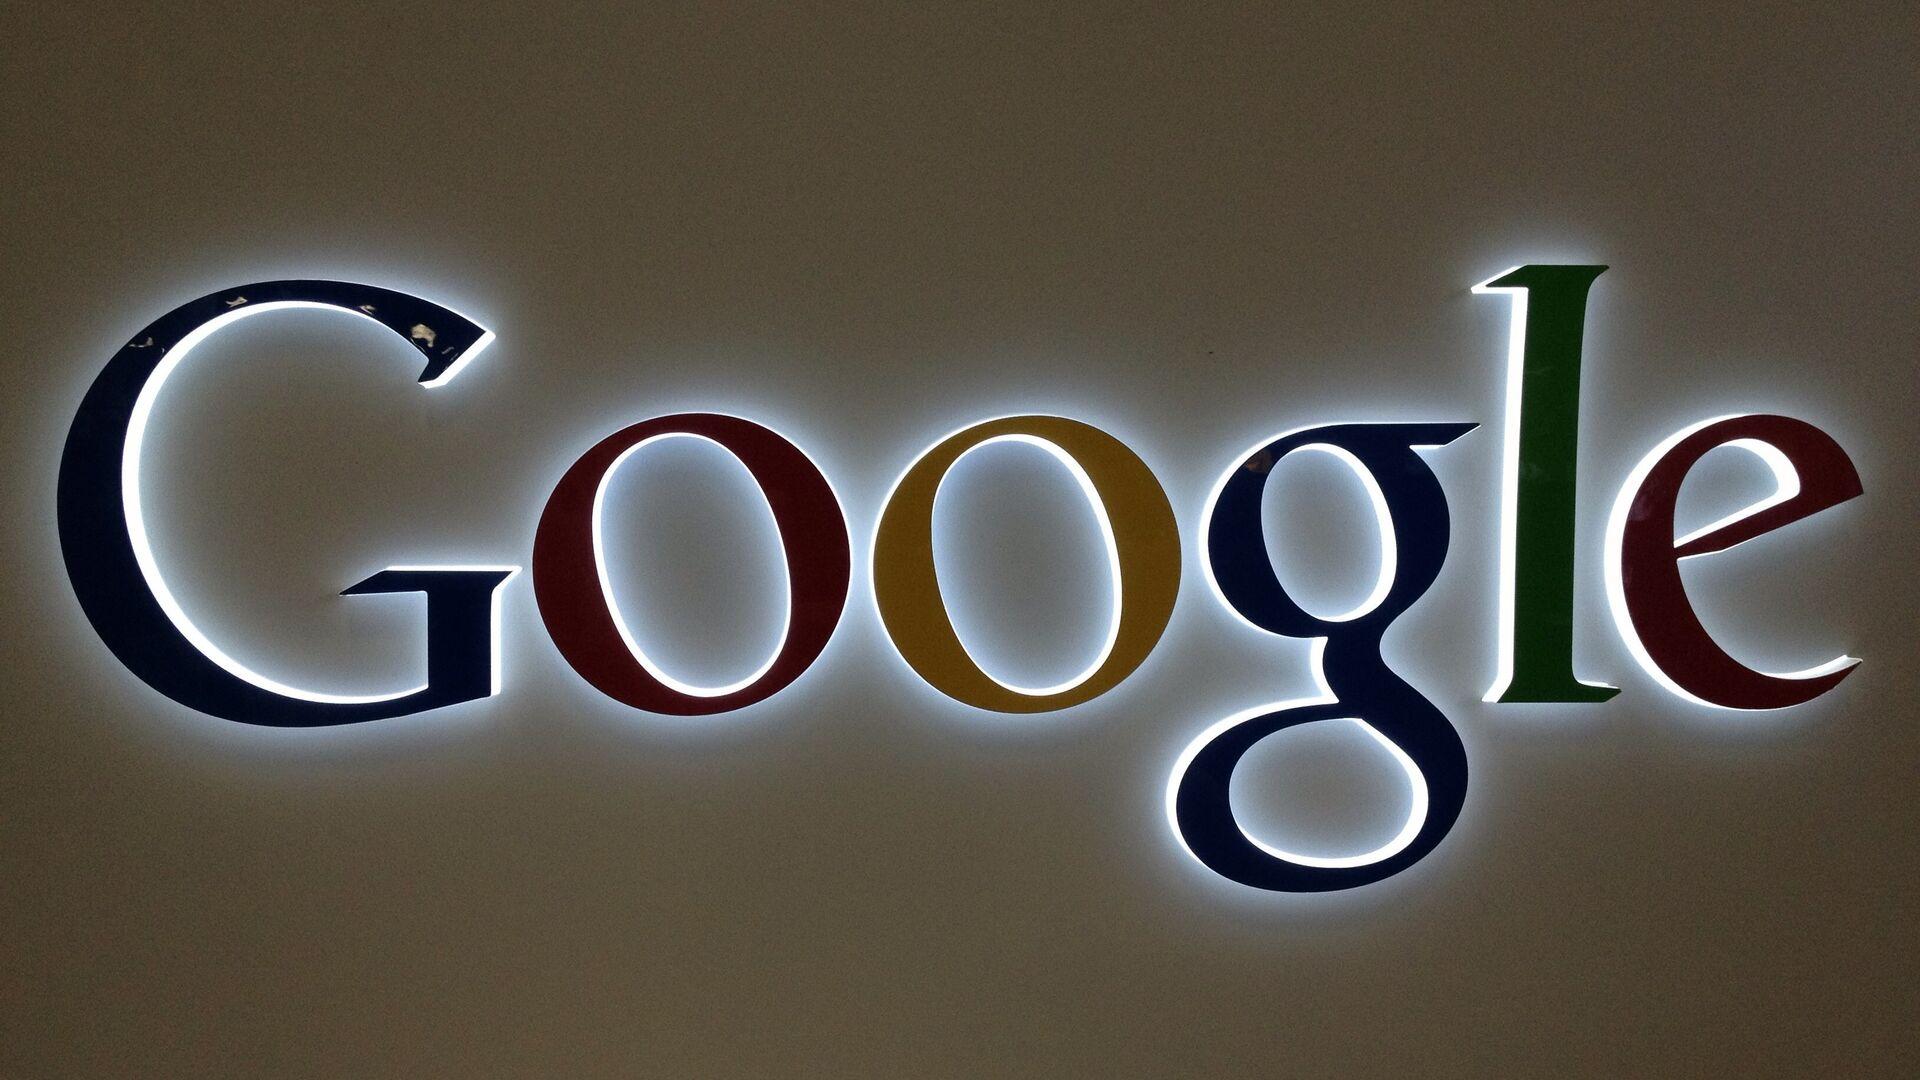 El logo de Google - Sputnik Mundo, 1920, 29.07.2021